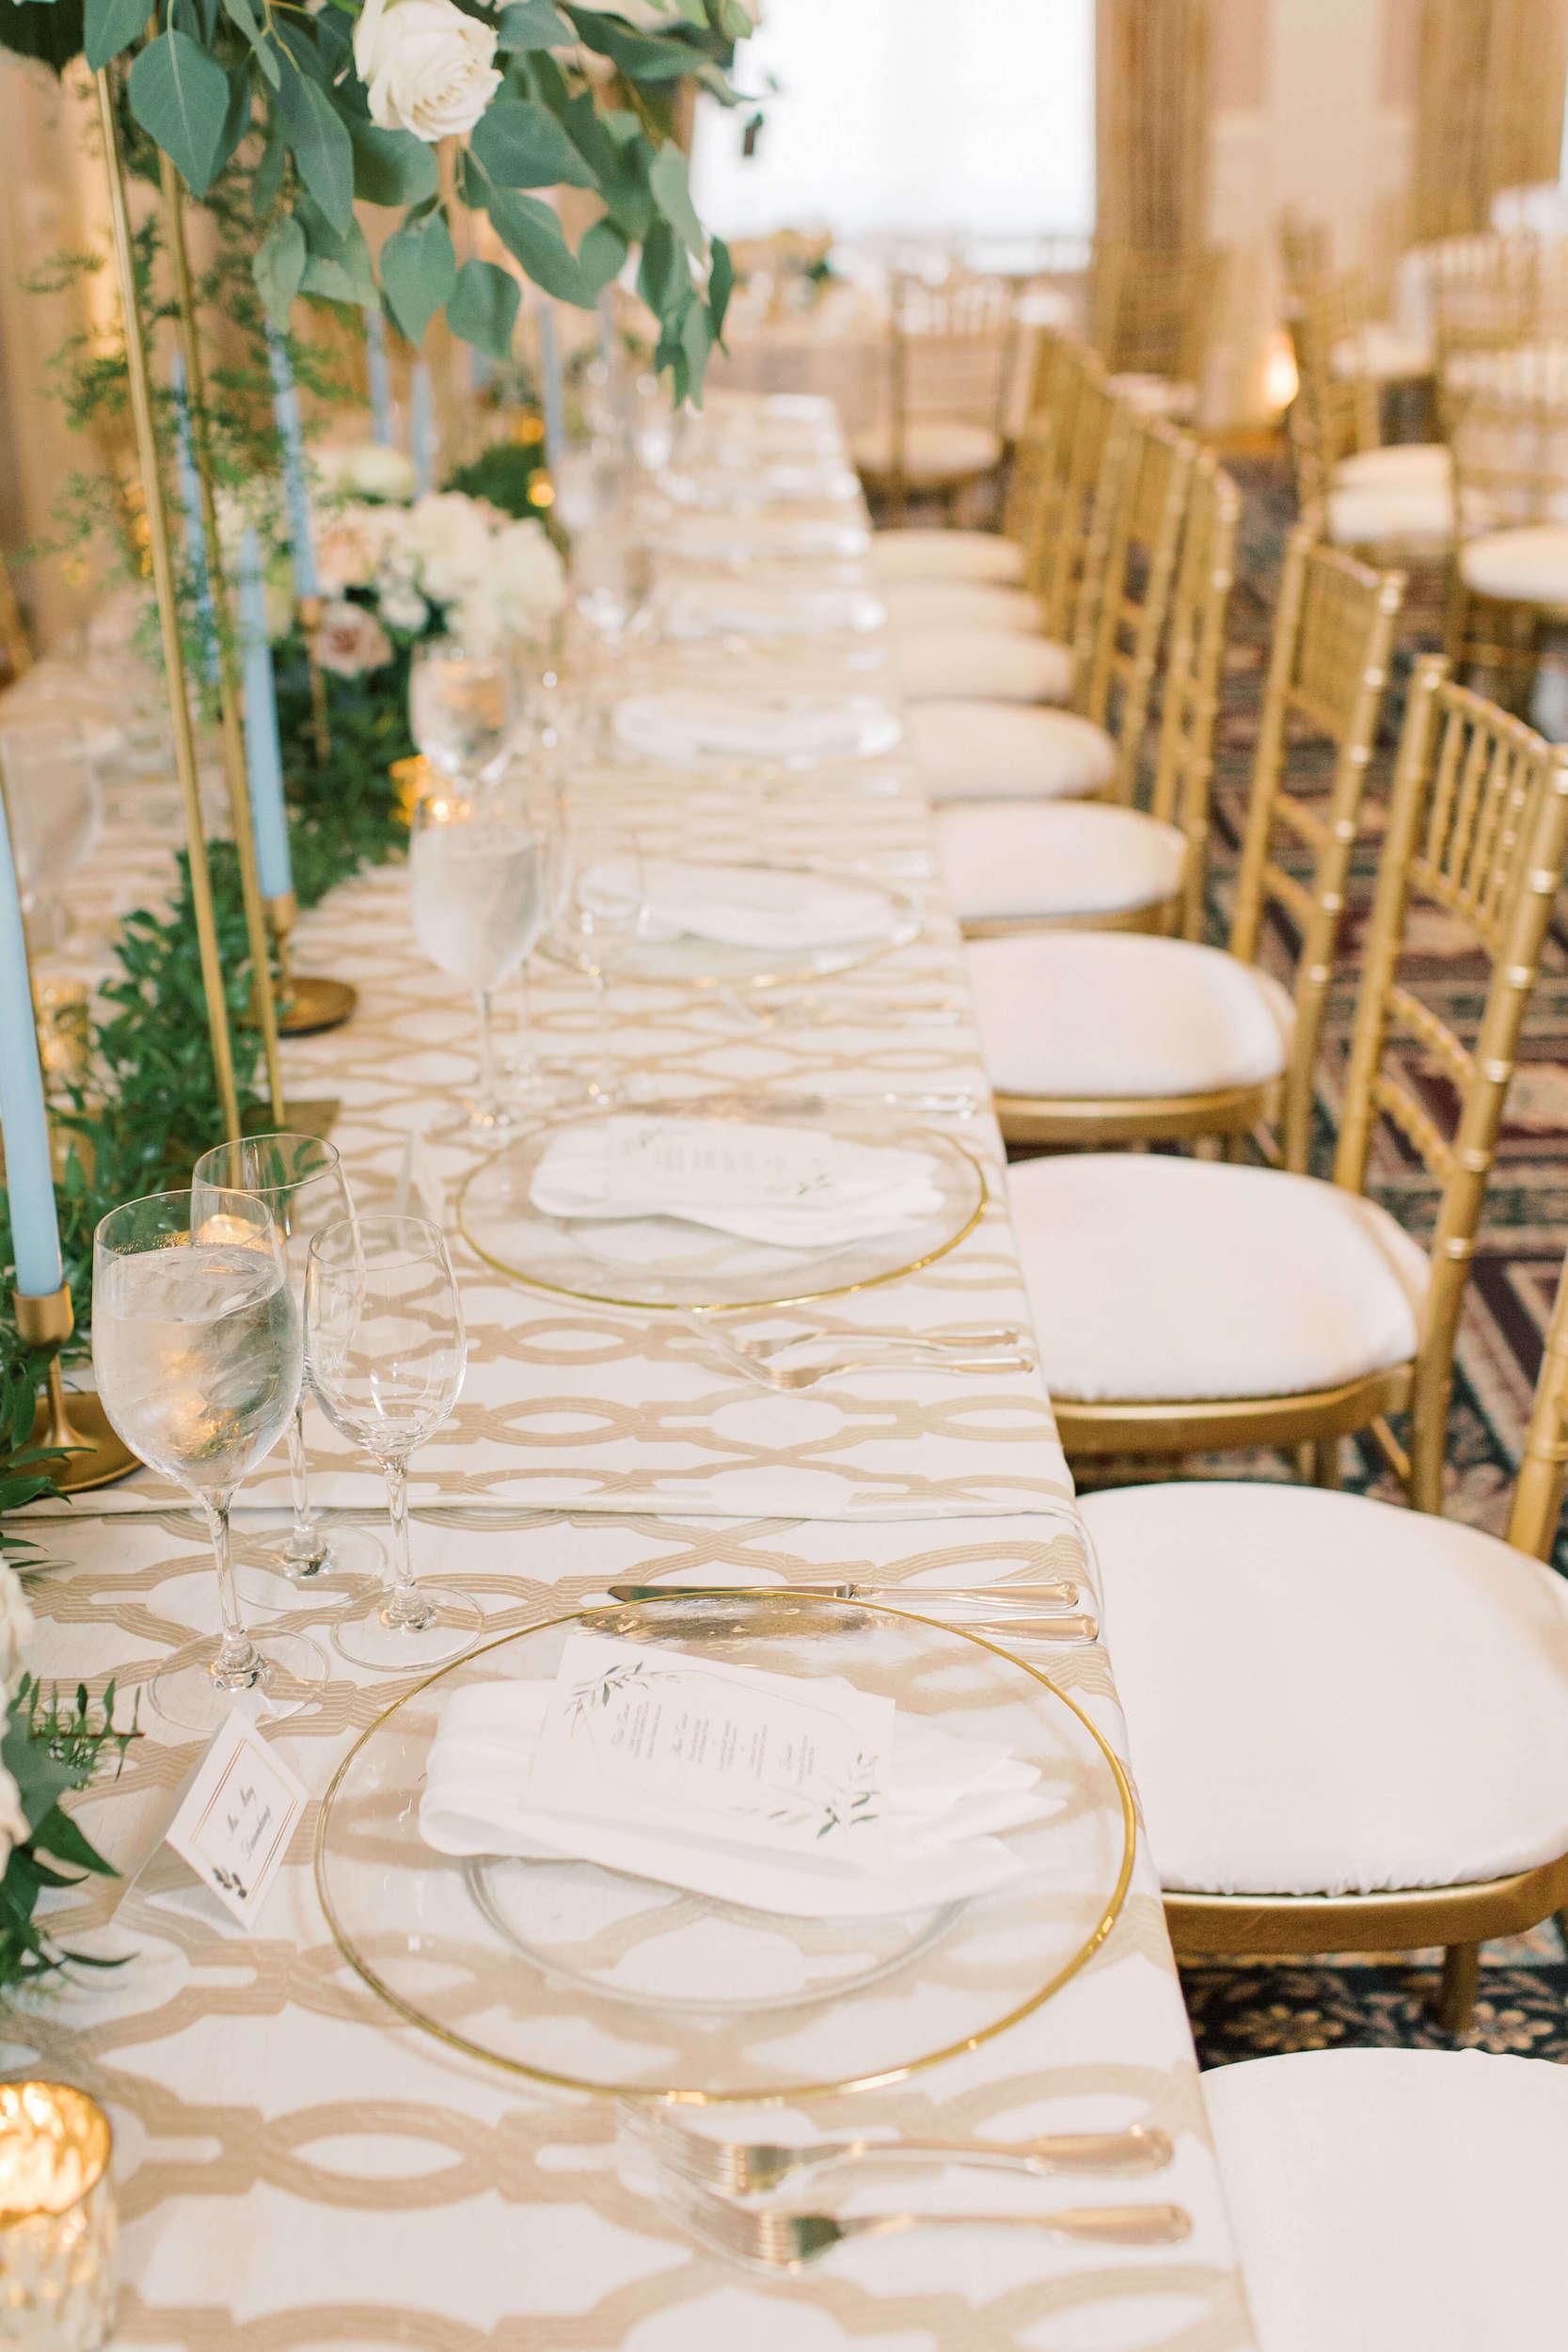 Carnegie institution for science wedding  (20).jpg